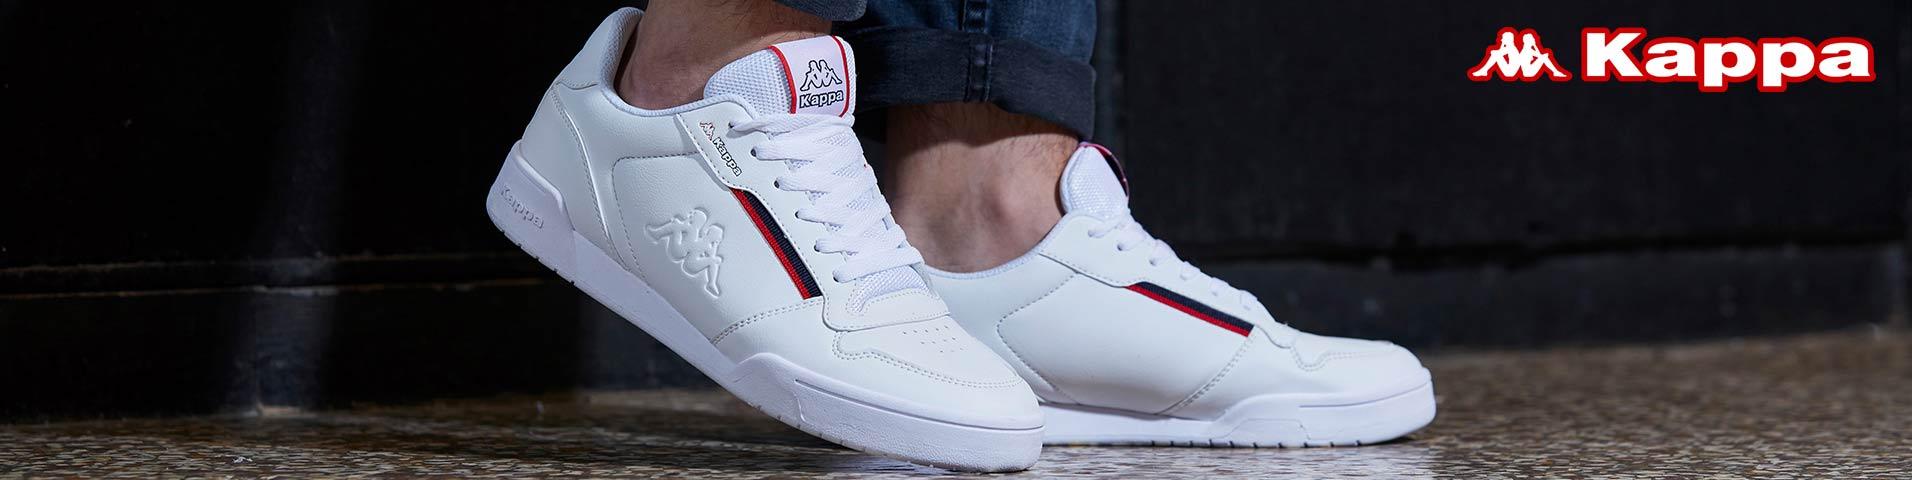 Scarpe donna Kappa | Grande assortimento di calzature su Zalando